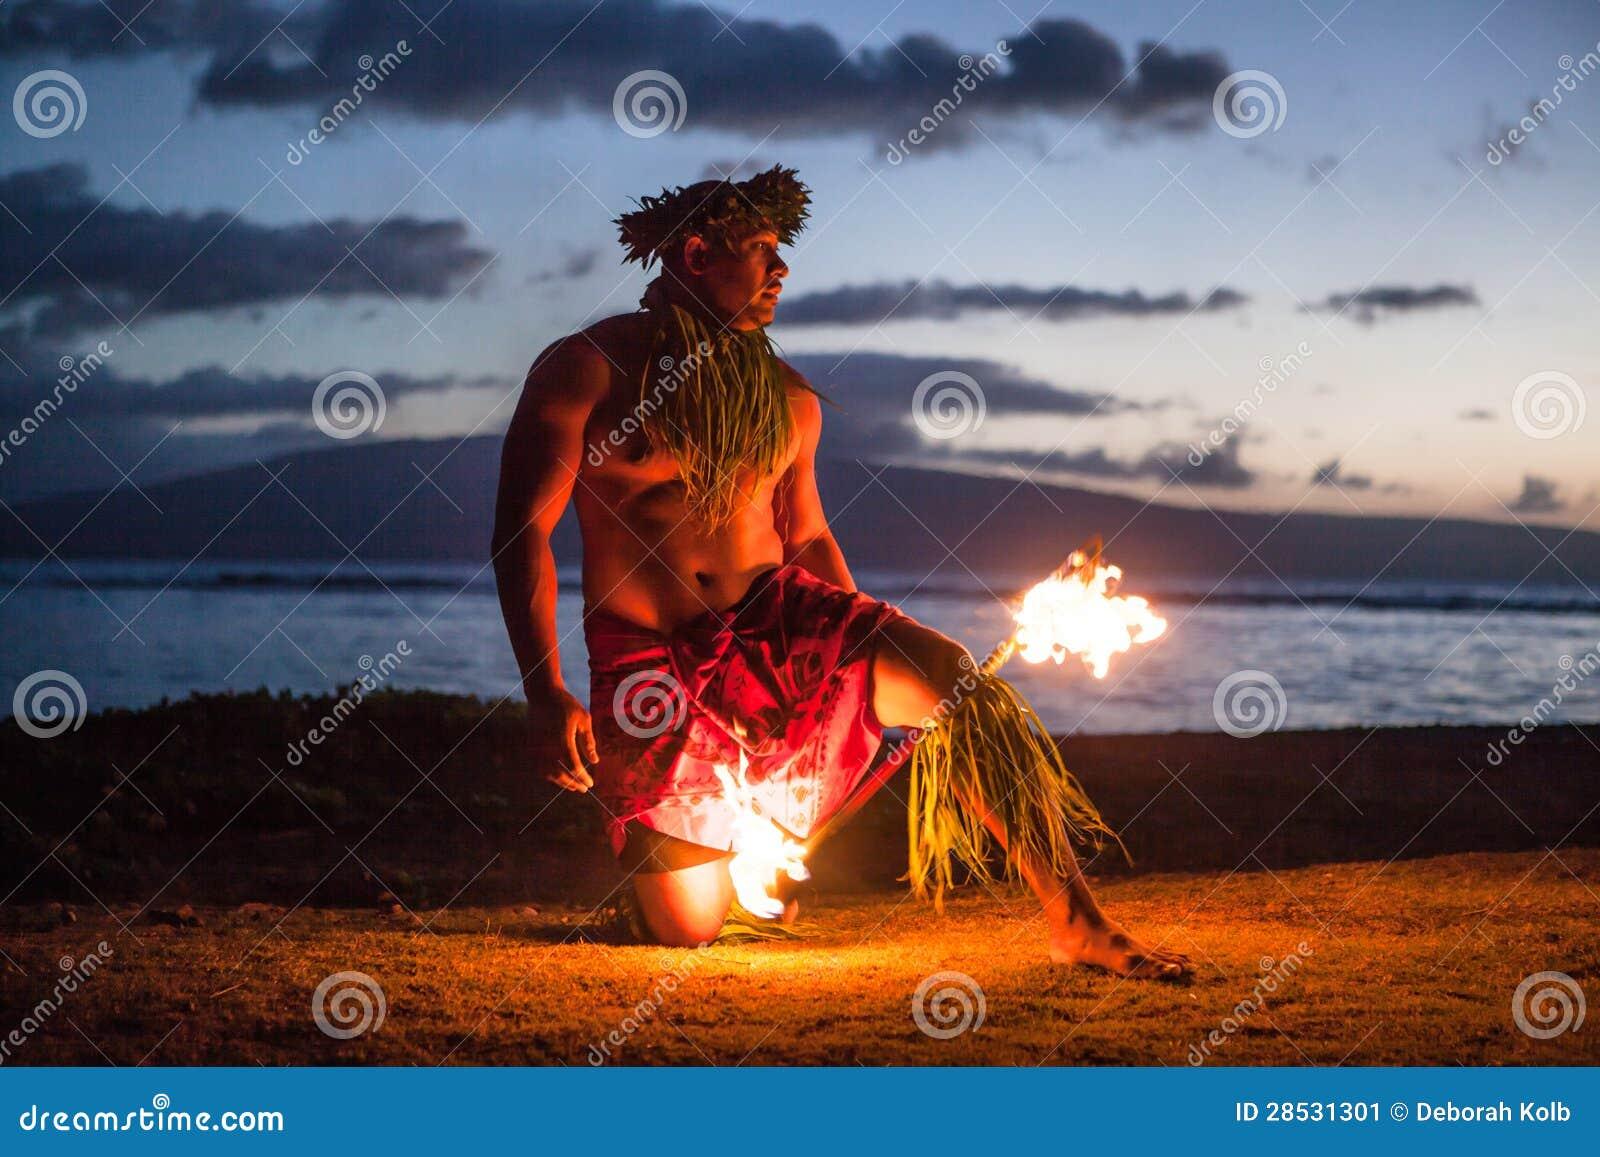 Ocean Beach Fire Dancers